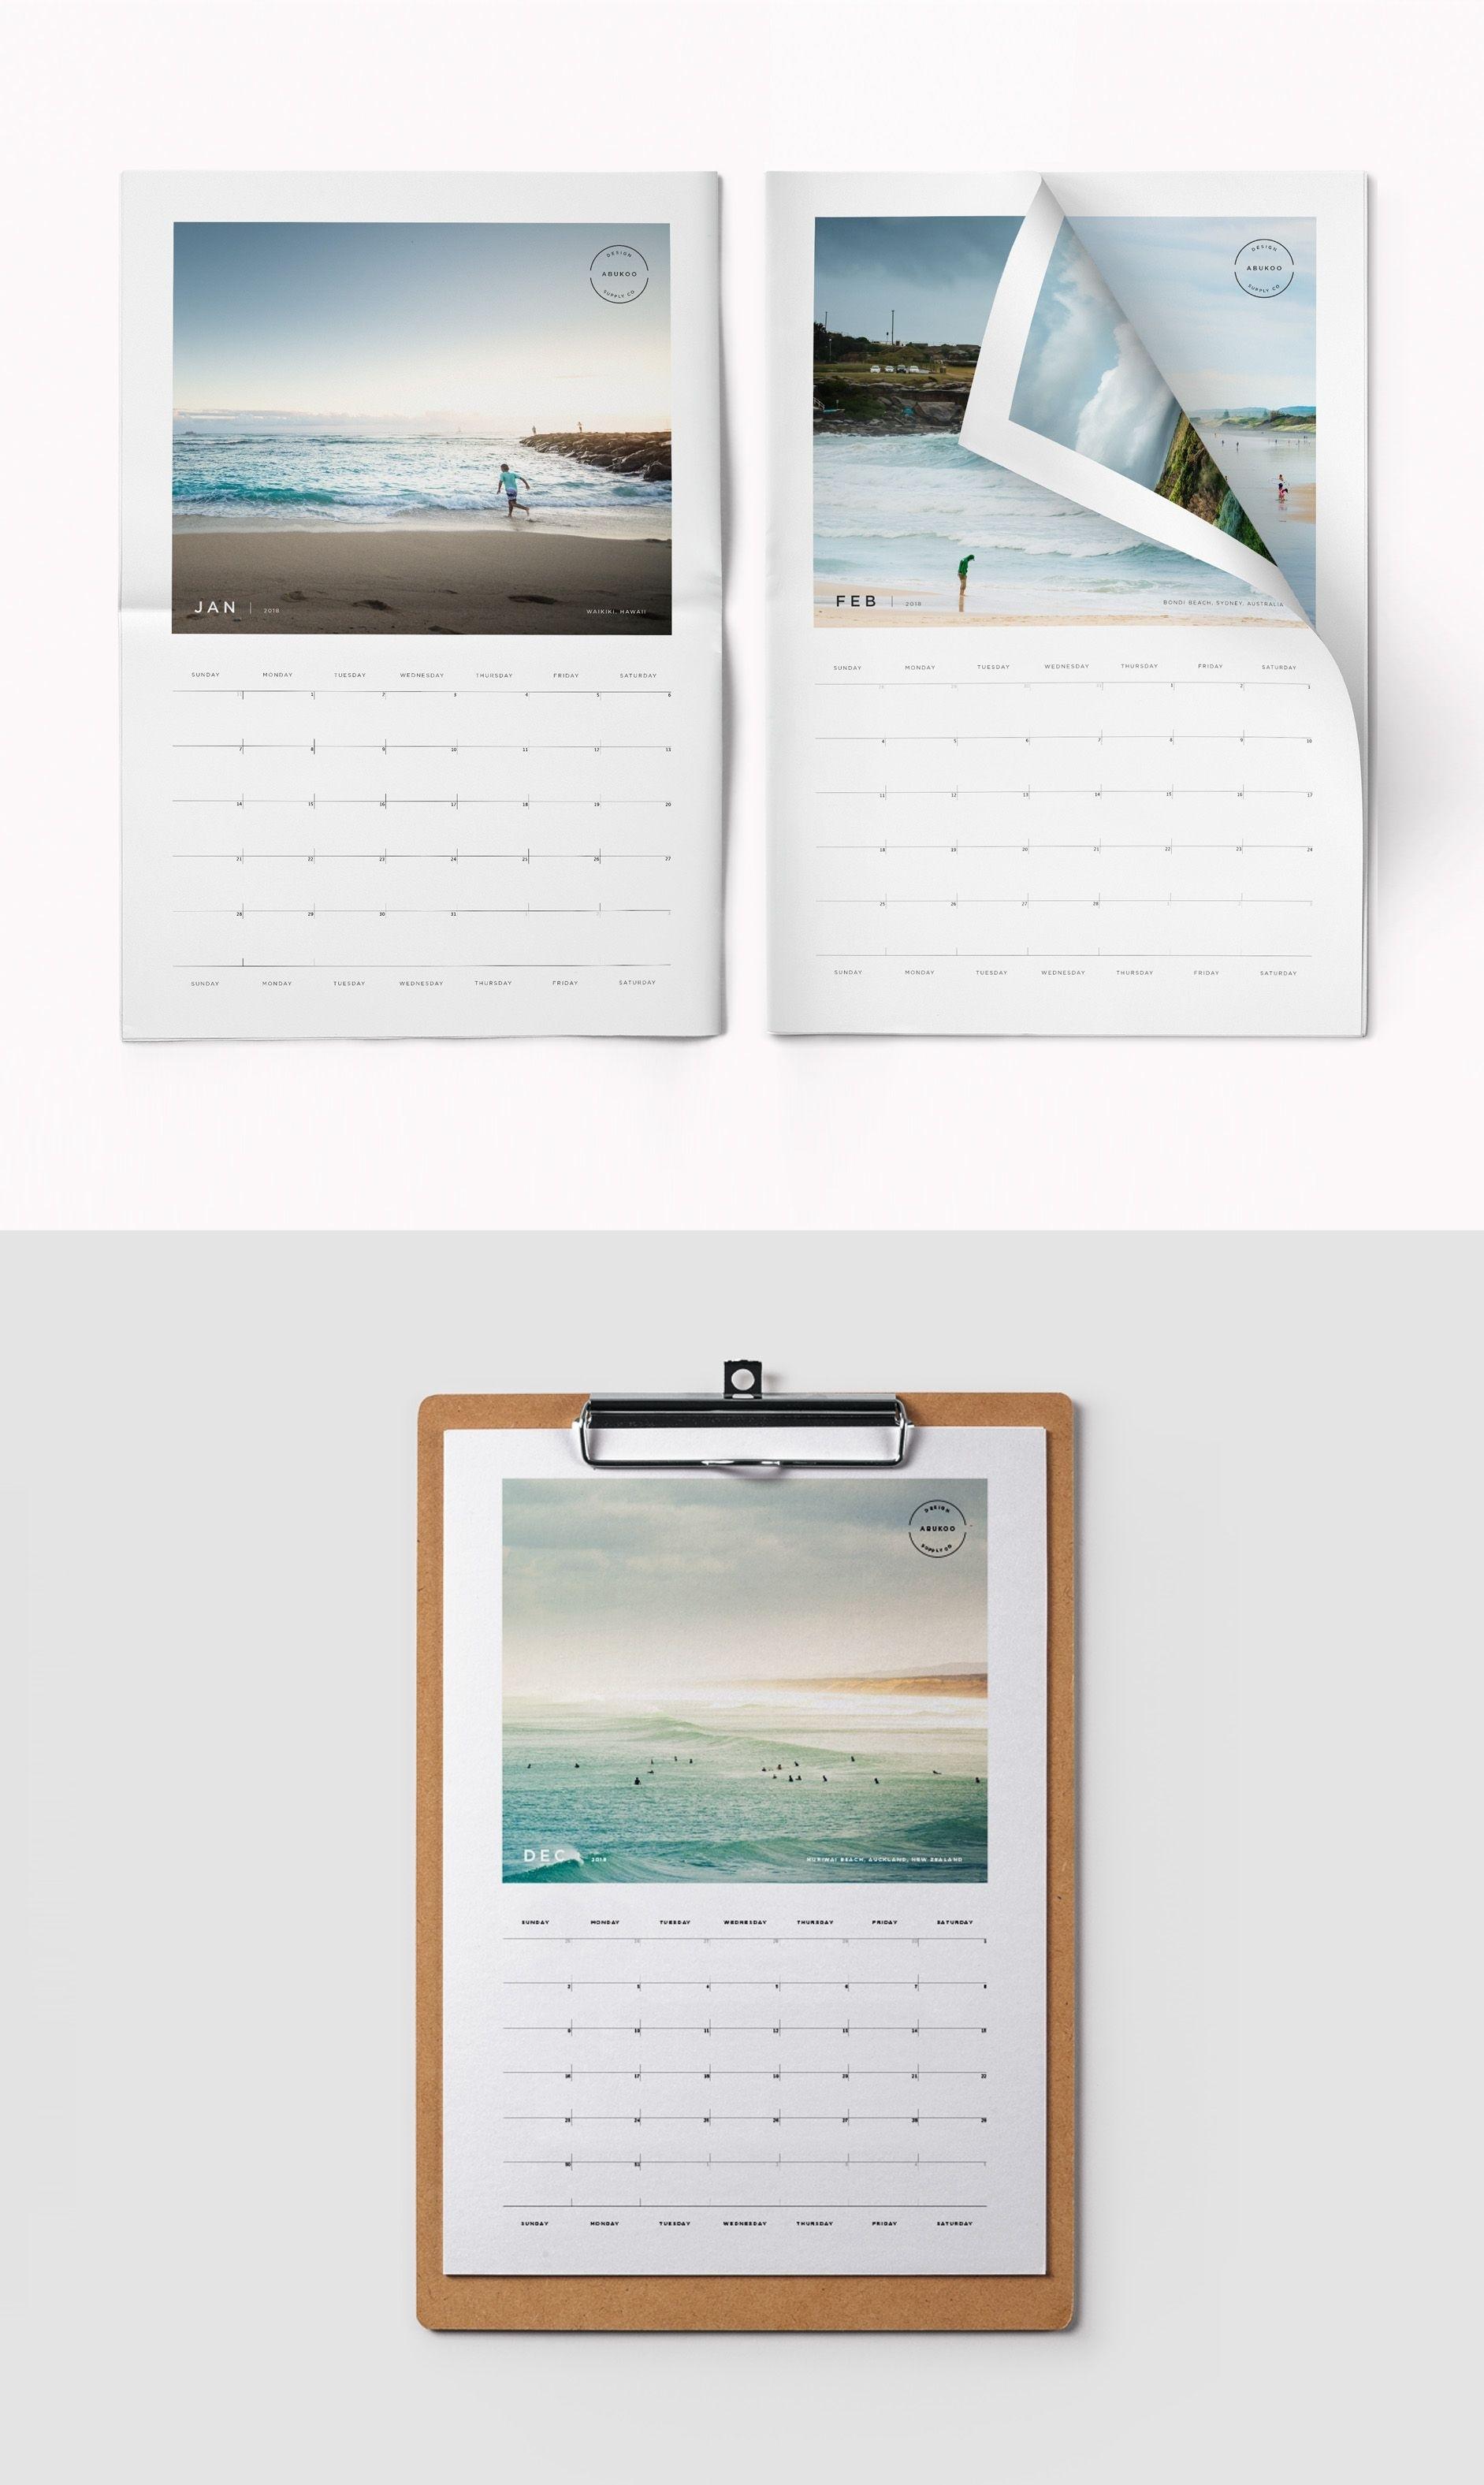 2018 Printable Photo Calendar   Indesign Template   Graphic Design Calendar Template Add Your Own Photos